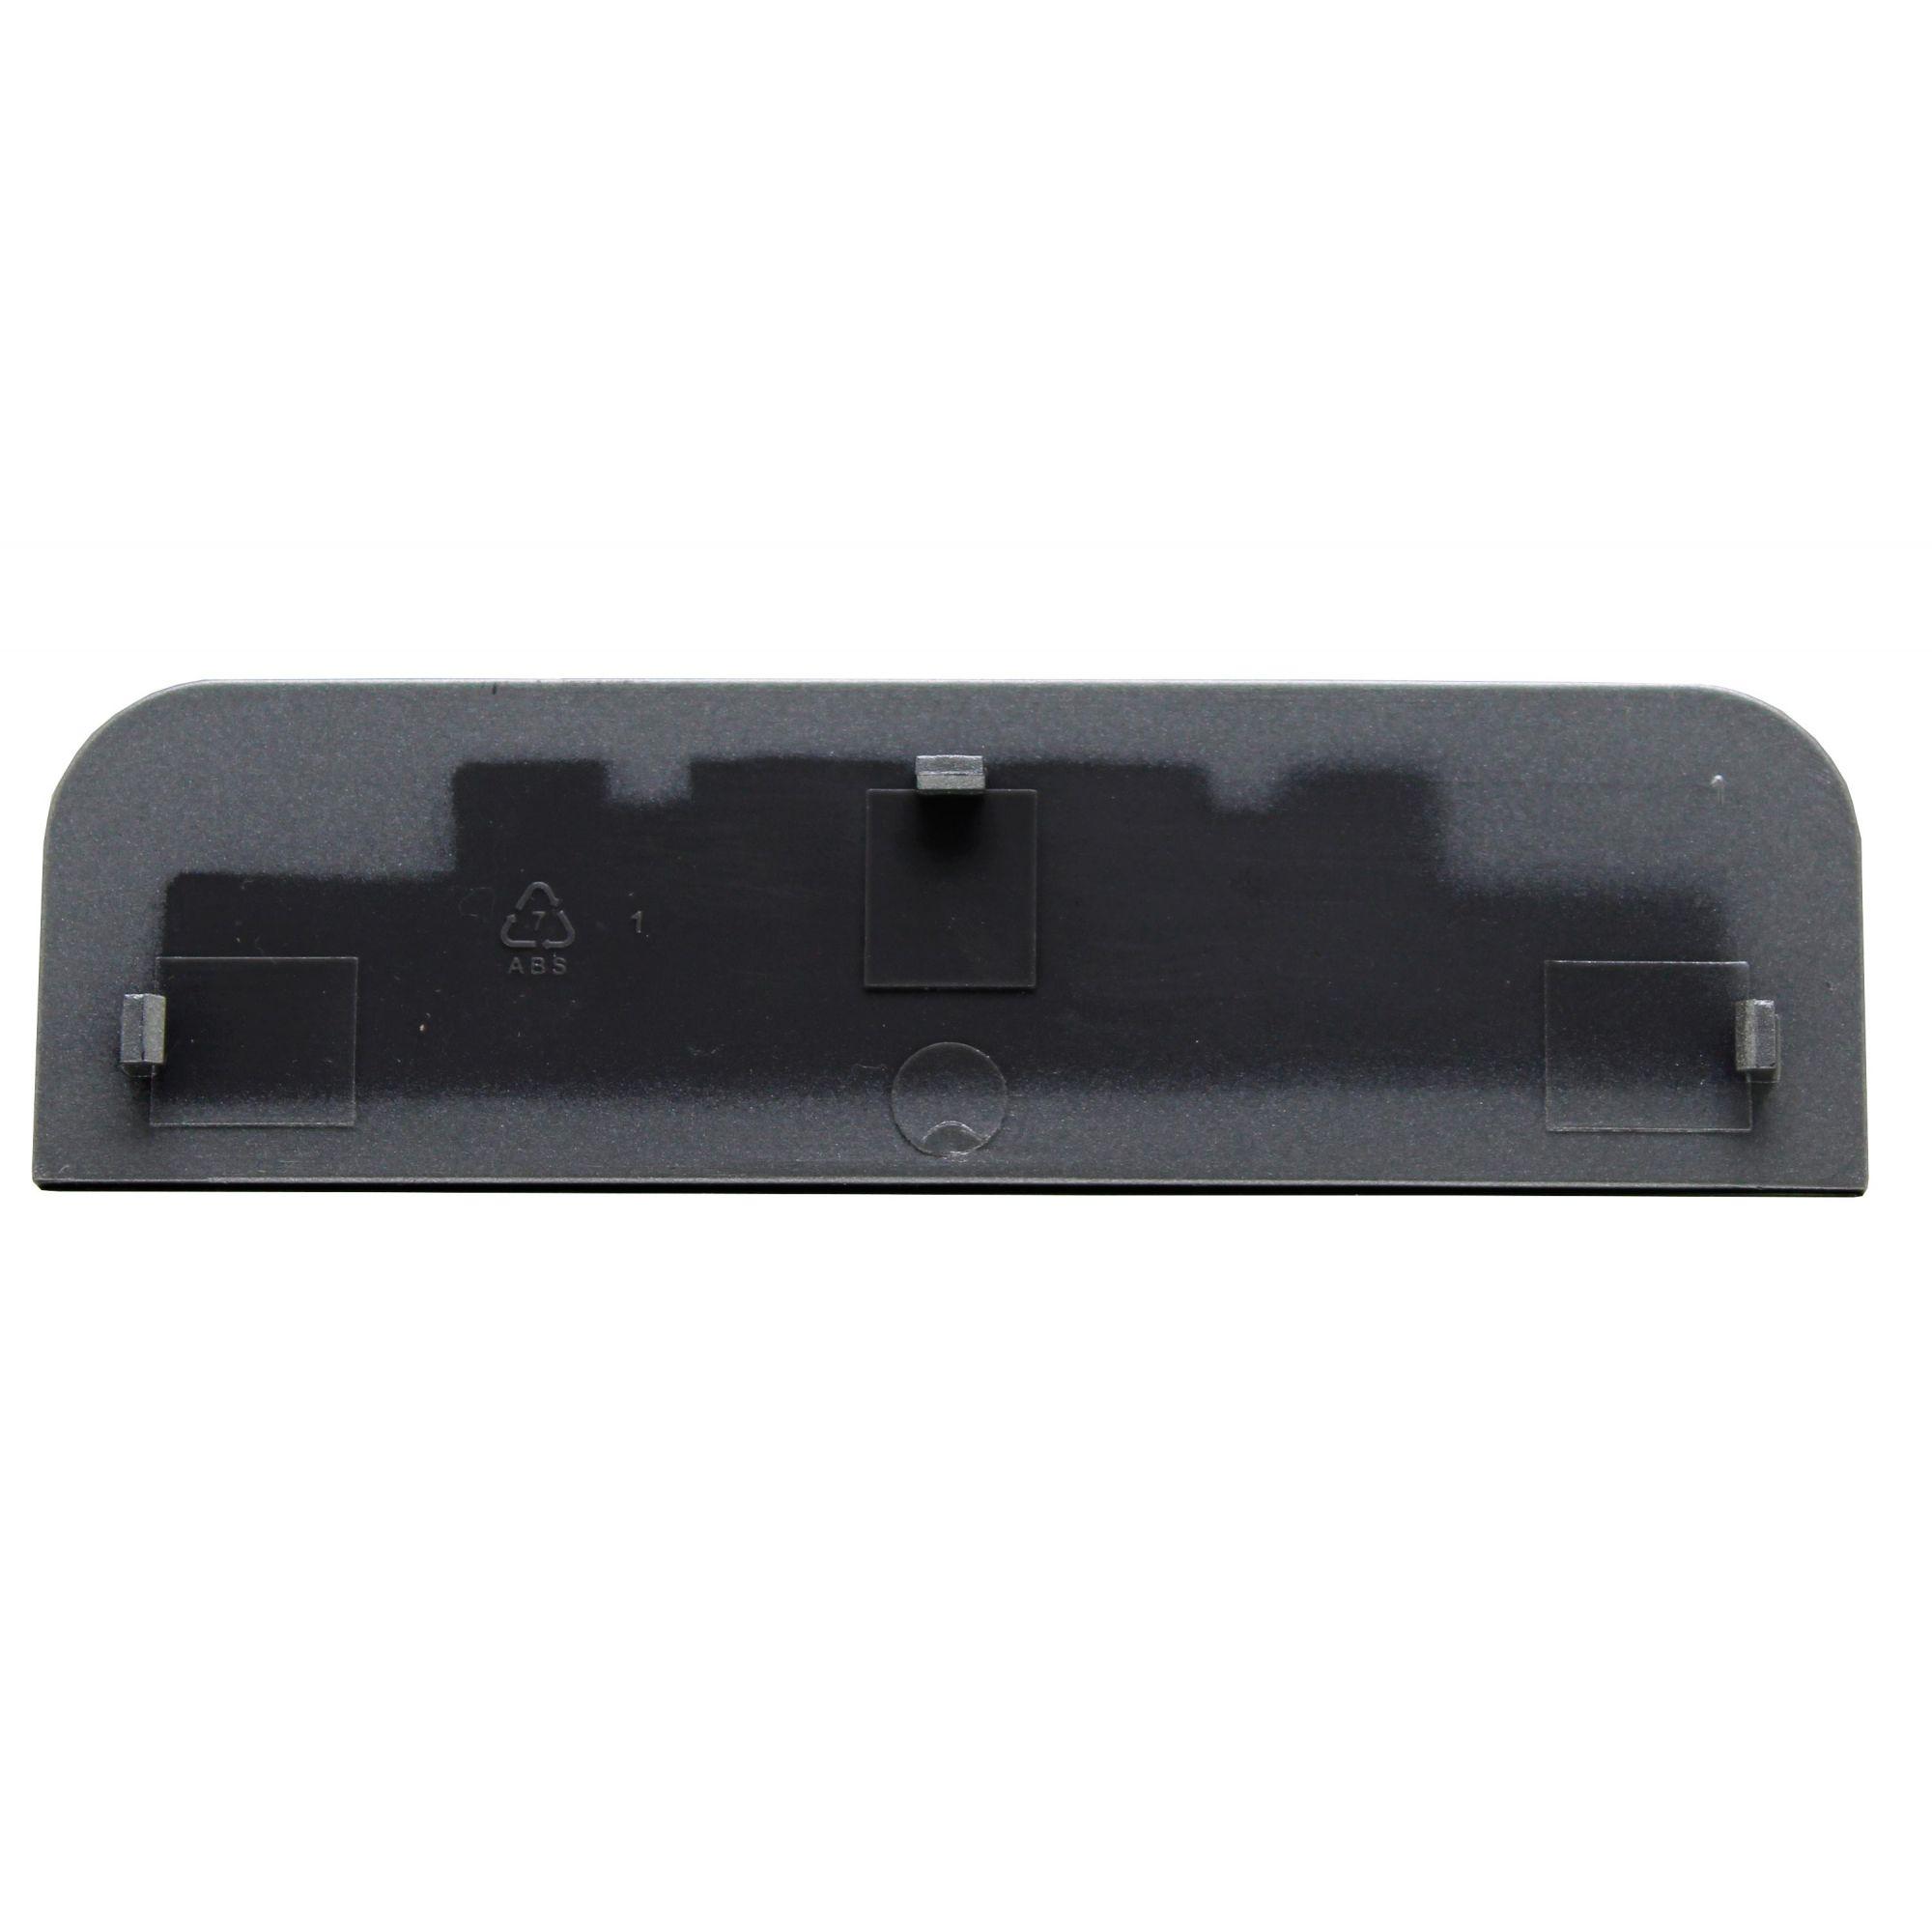 Arremate Externo Dispenser Inox Refrigerador Electrolux 67492754